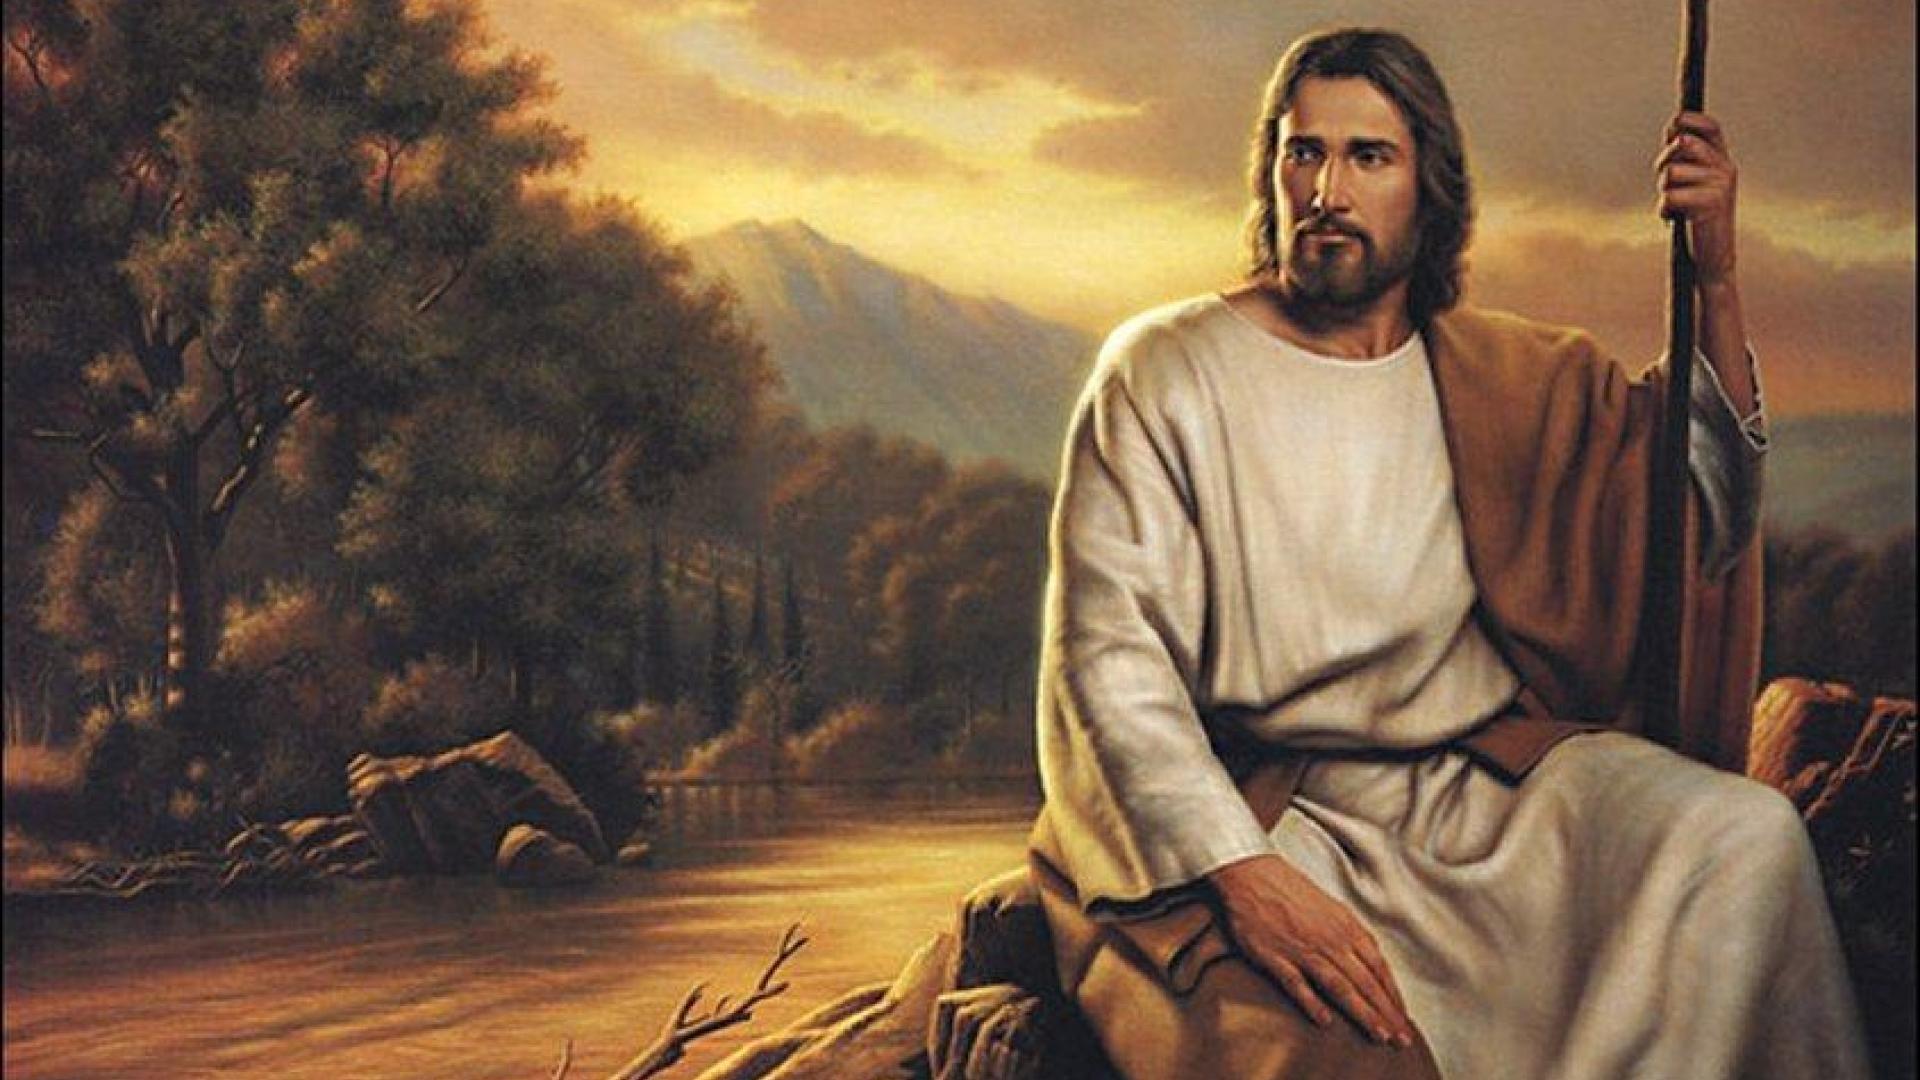 Sacred Heart of Jesus Wallpaper ·â'